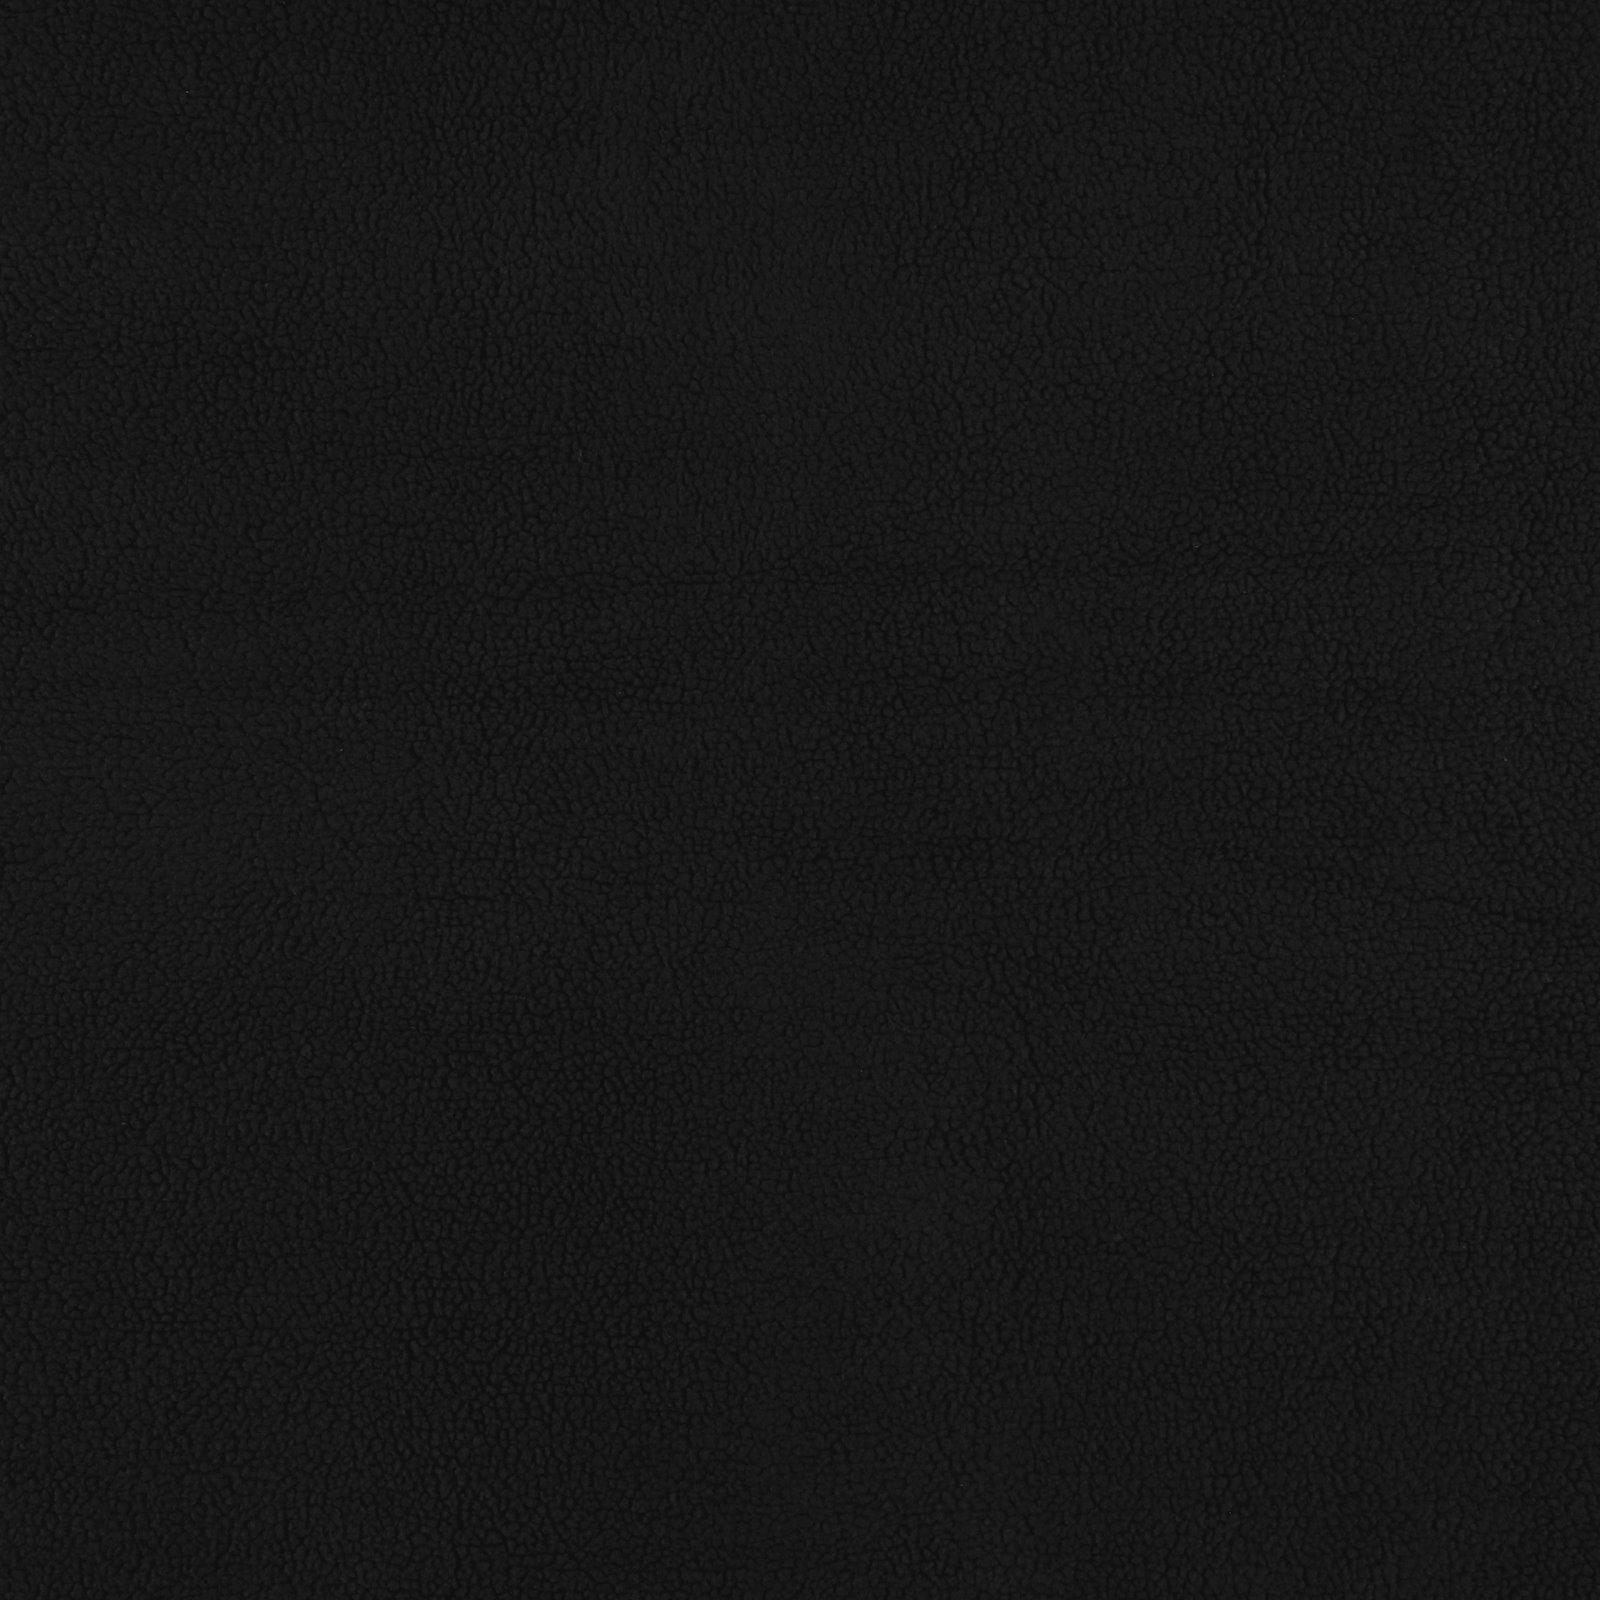 Teddy bear black 910293_pack_solid